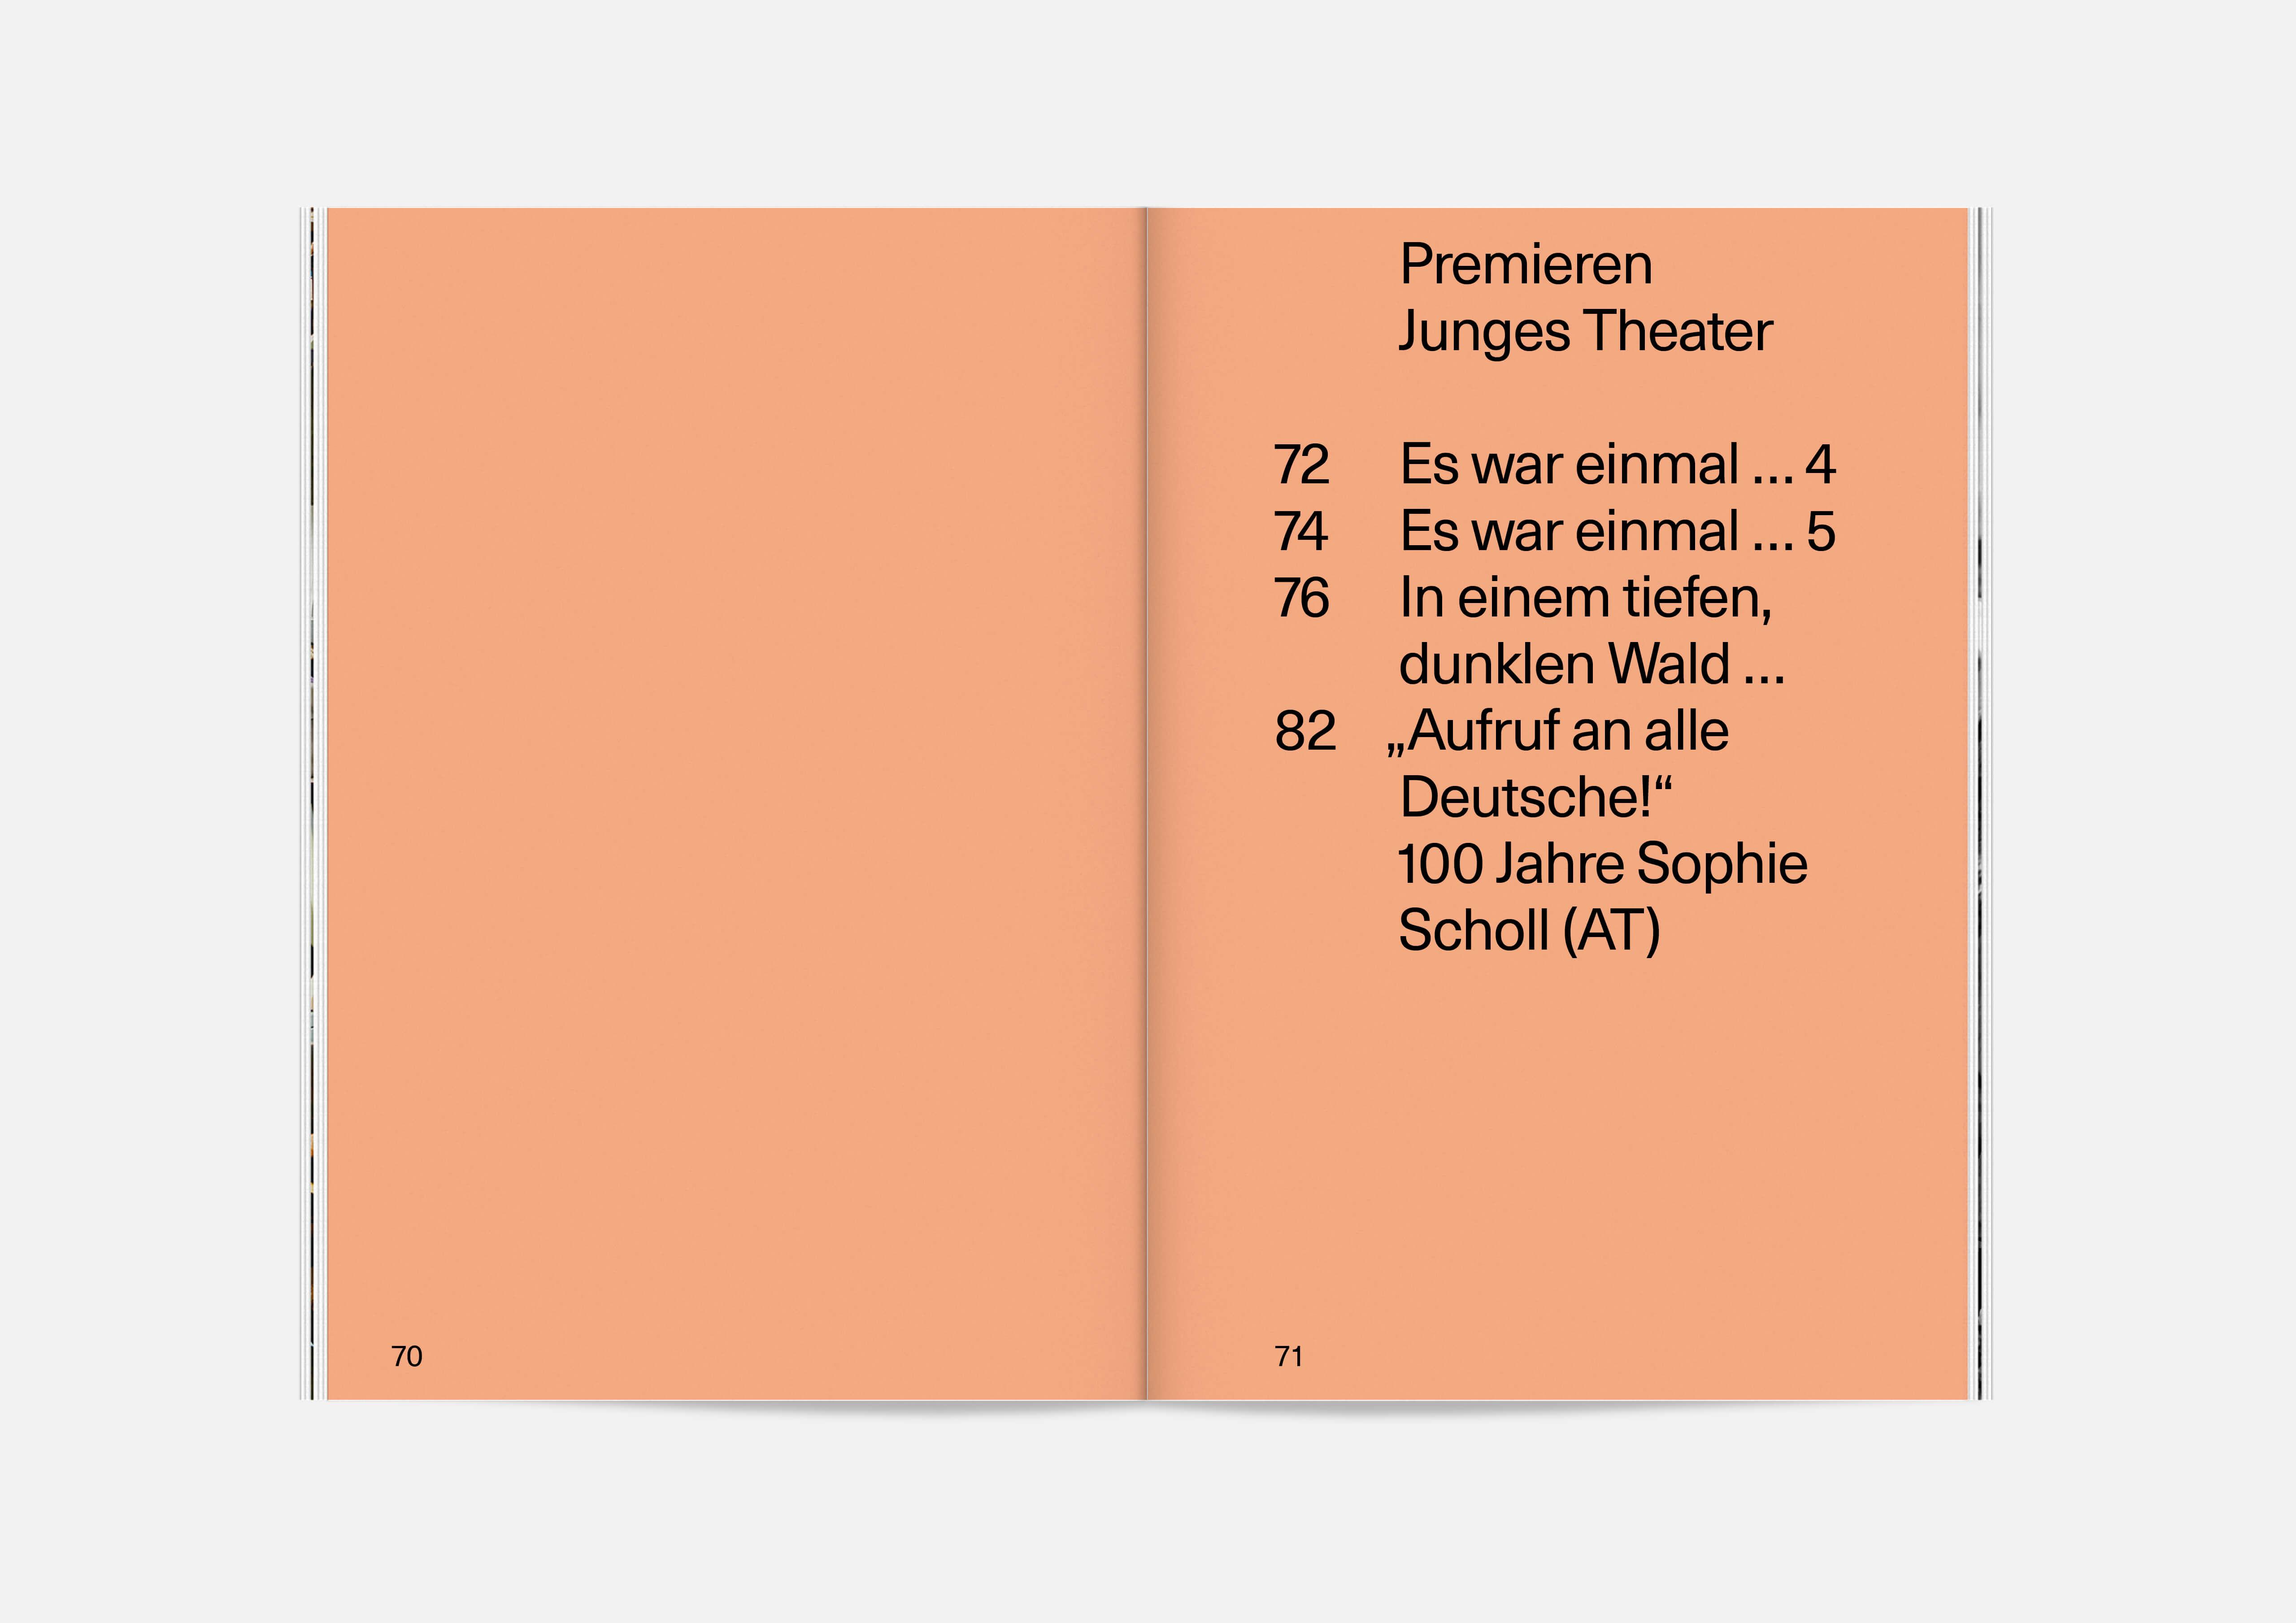 https://neuegestaltung.de/media/pages/clients/theater-erlangen-season-program-20-21/d9efc523b5-1606409613/23_te-spielzeitheft2021.jpg